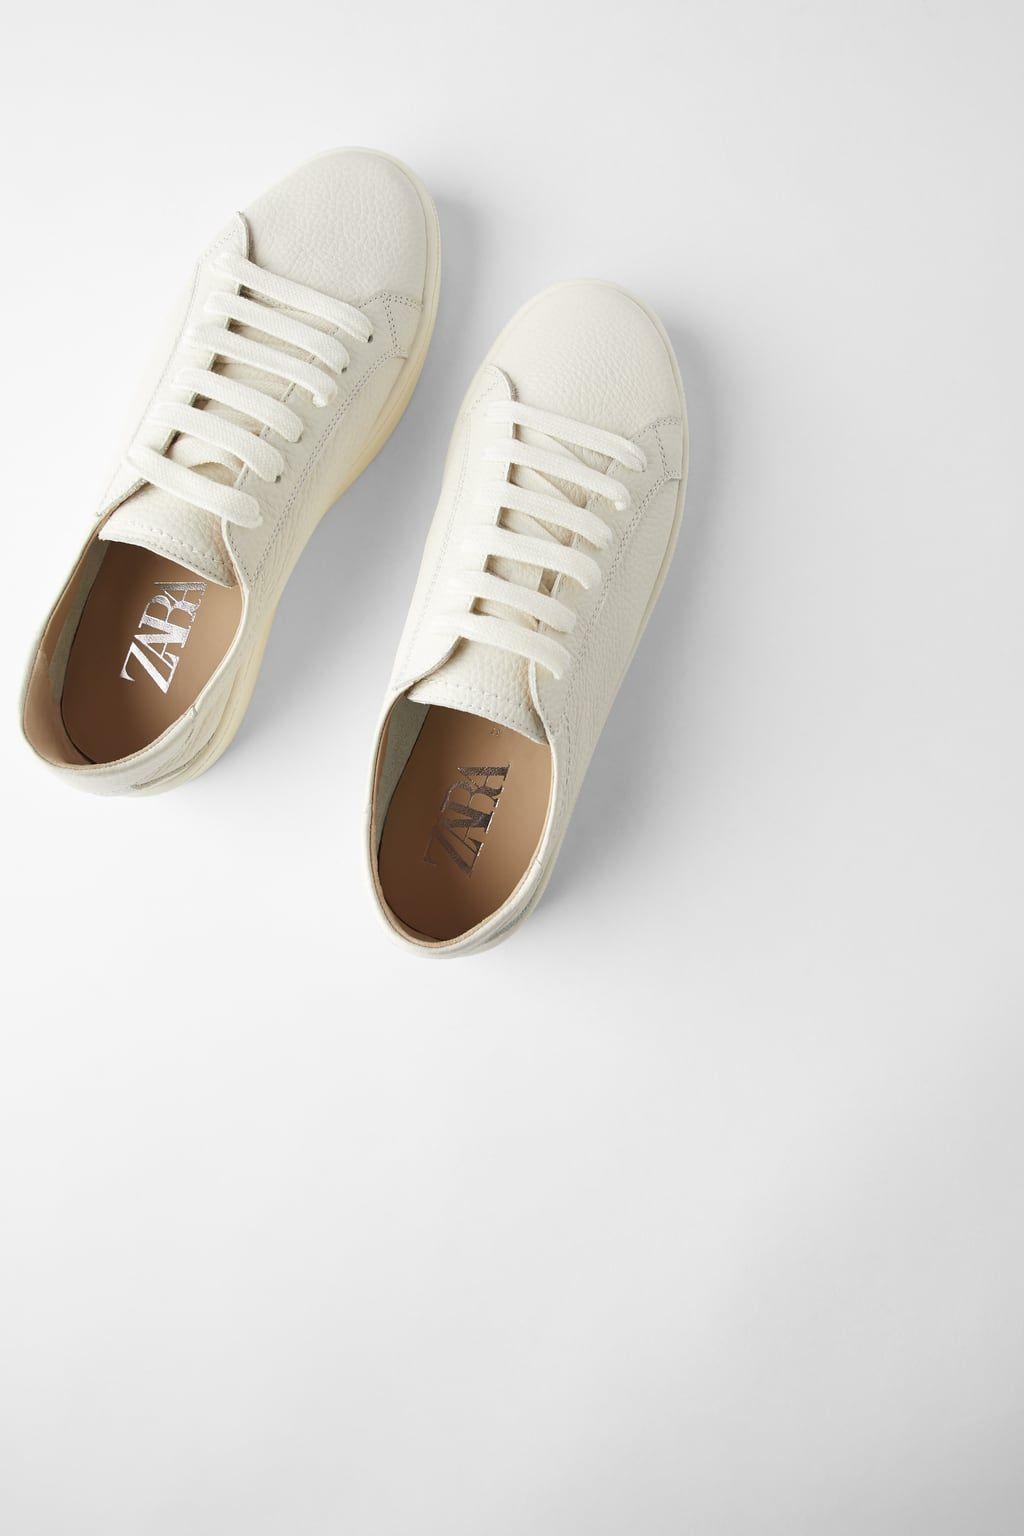 Skorzane Buty Sportowe Typu Soft Zara Polska Print Sneakers Sneakers Zara Sneakers